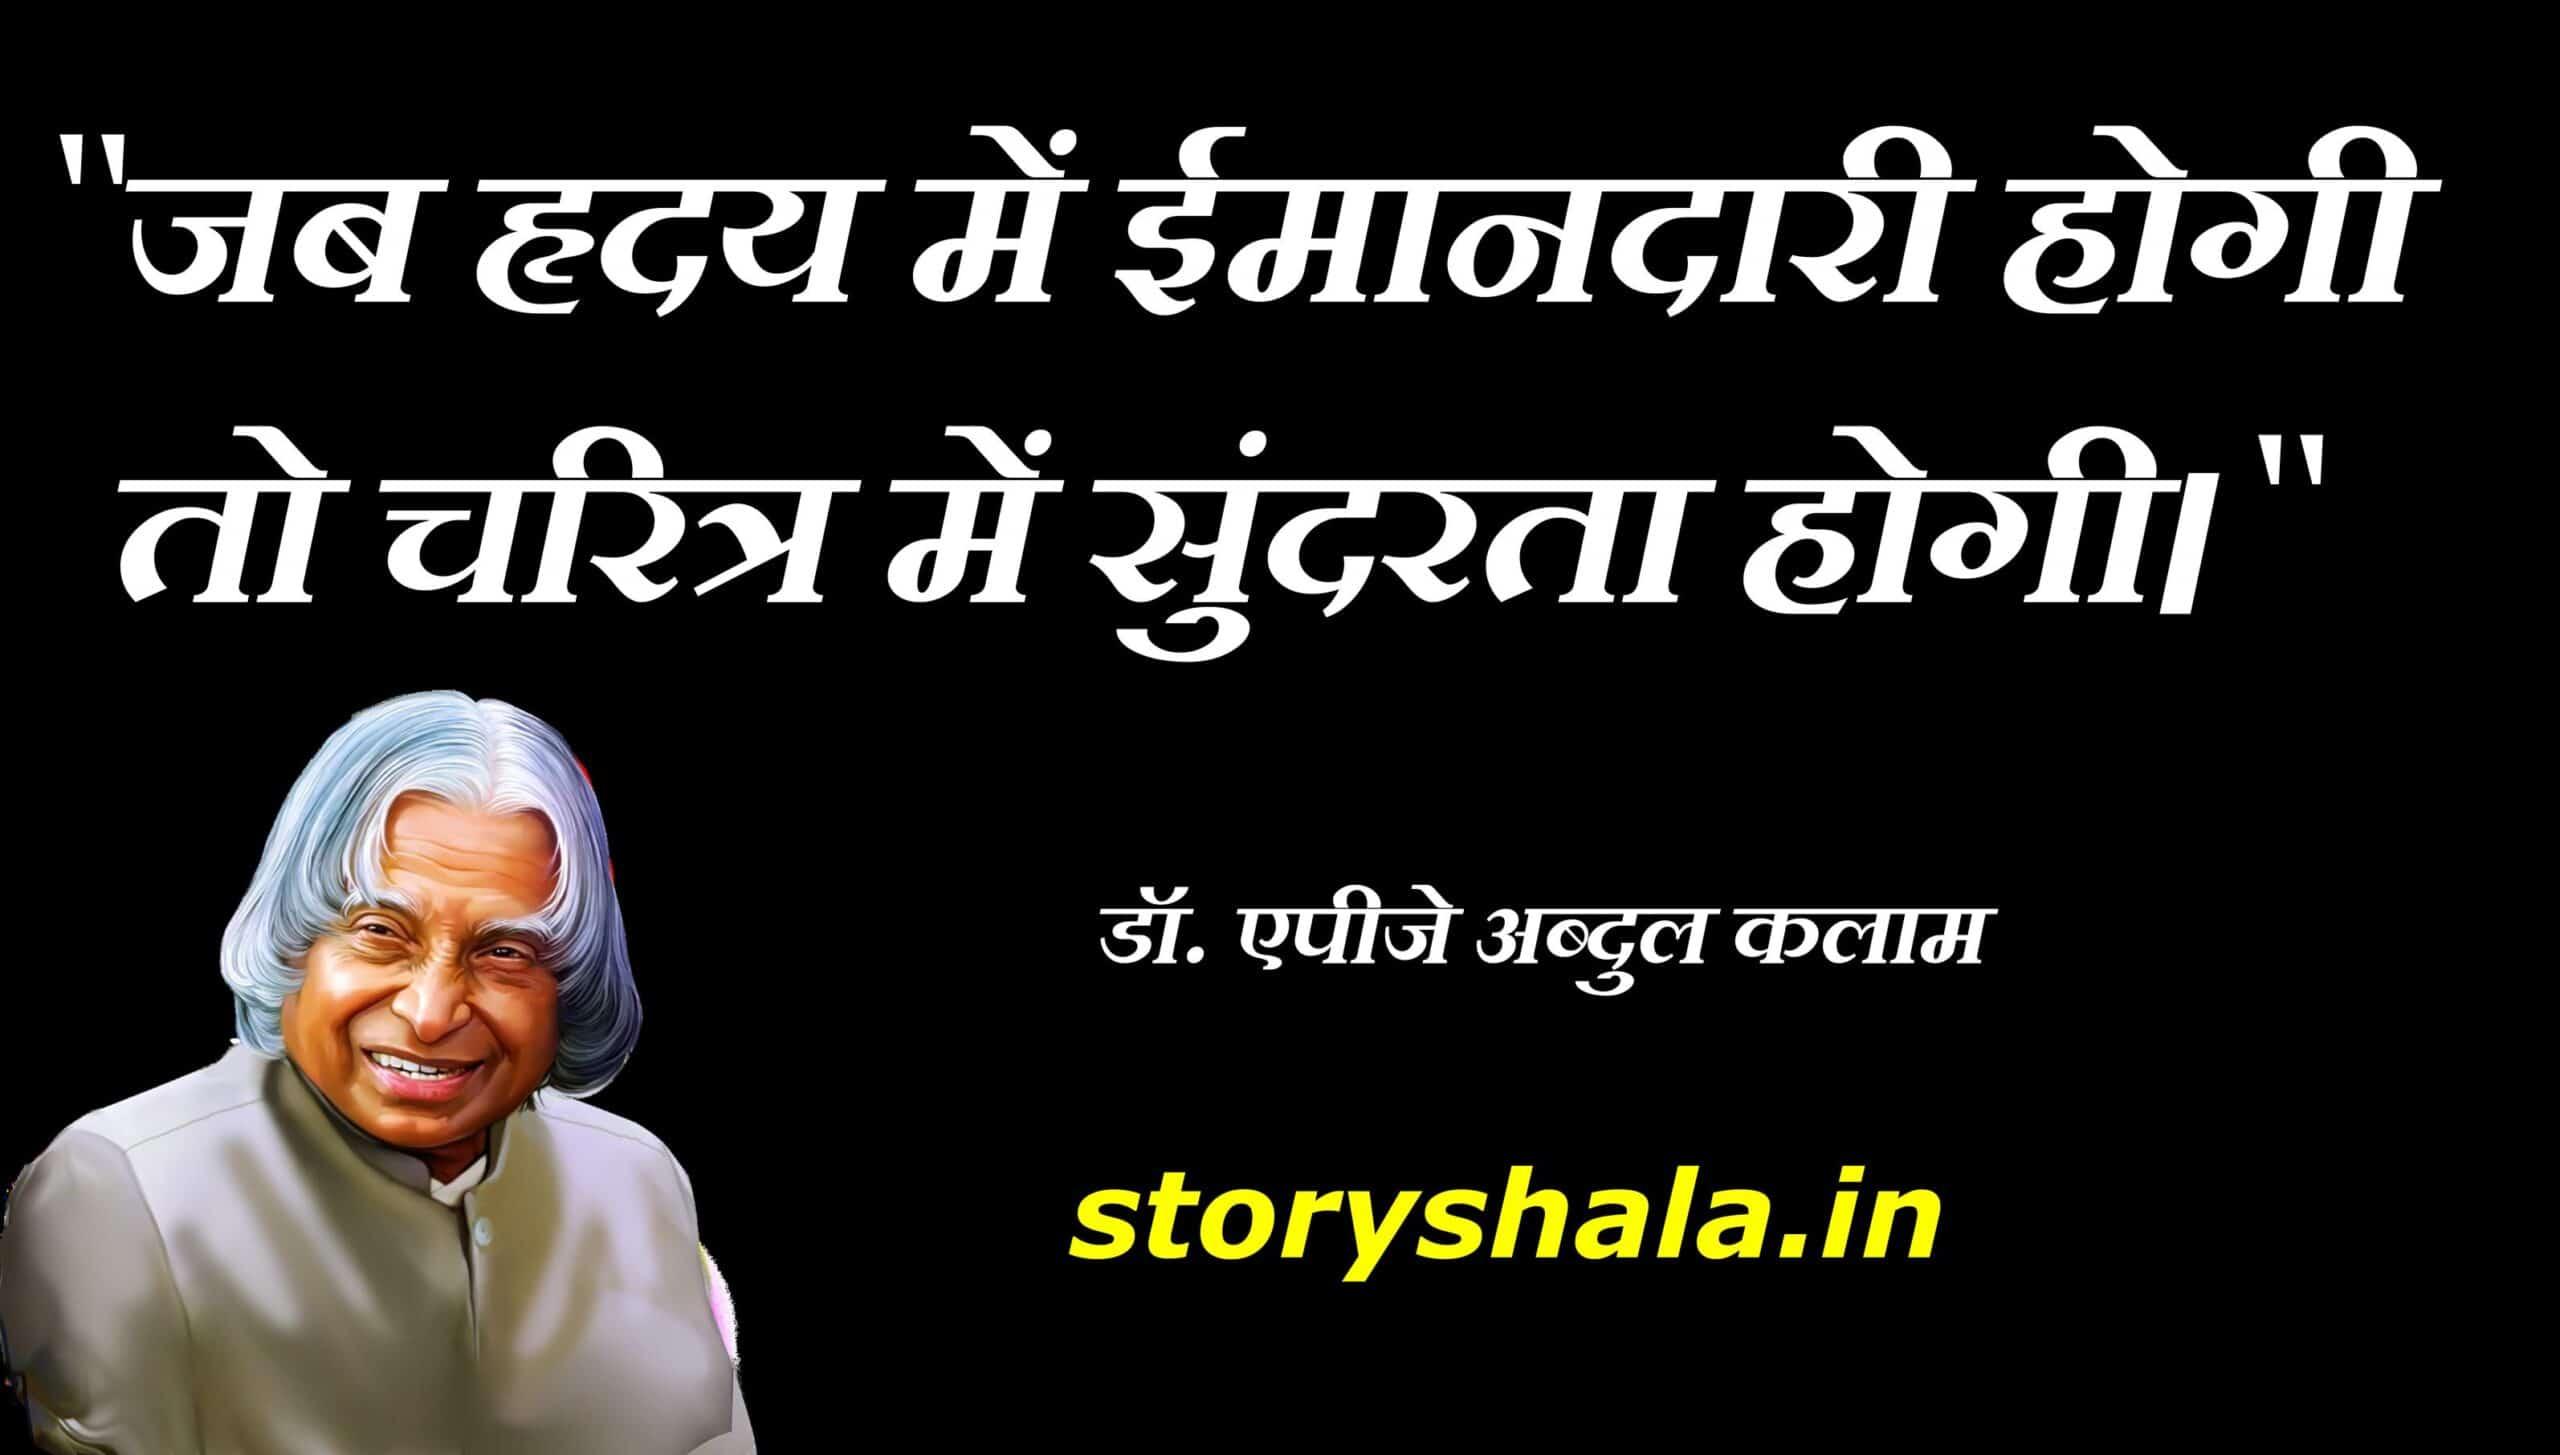 Top 50 Dr. APJ Abdul Kalam Quotes in Hindi ~ कलाम के 50 अनमोल वचन